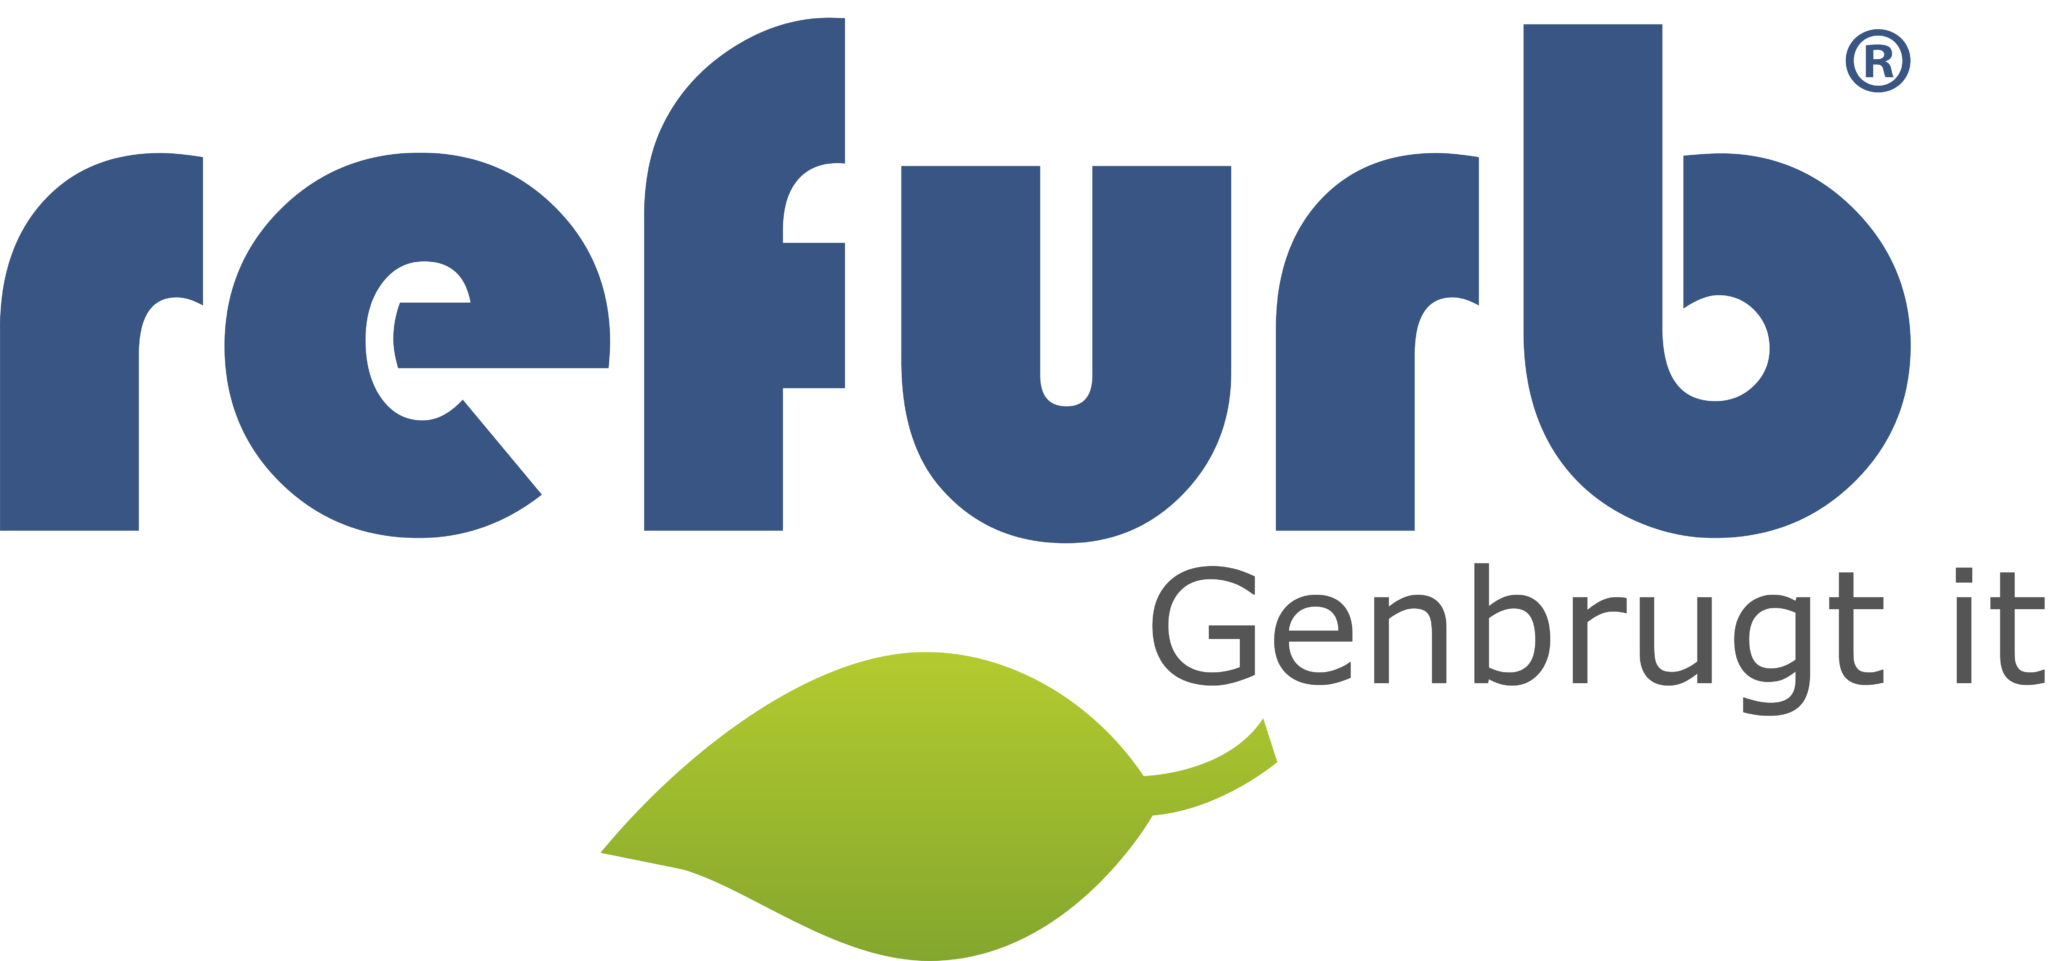 refurb_logo_DK_trademark